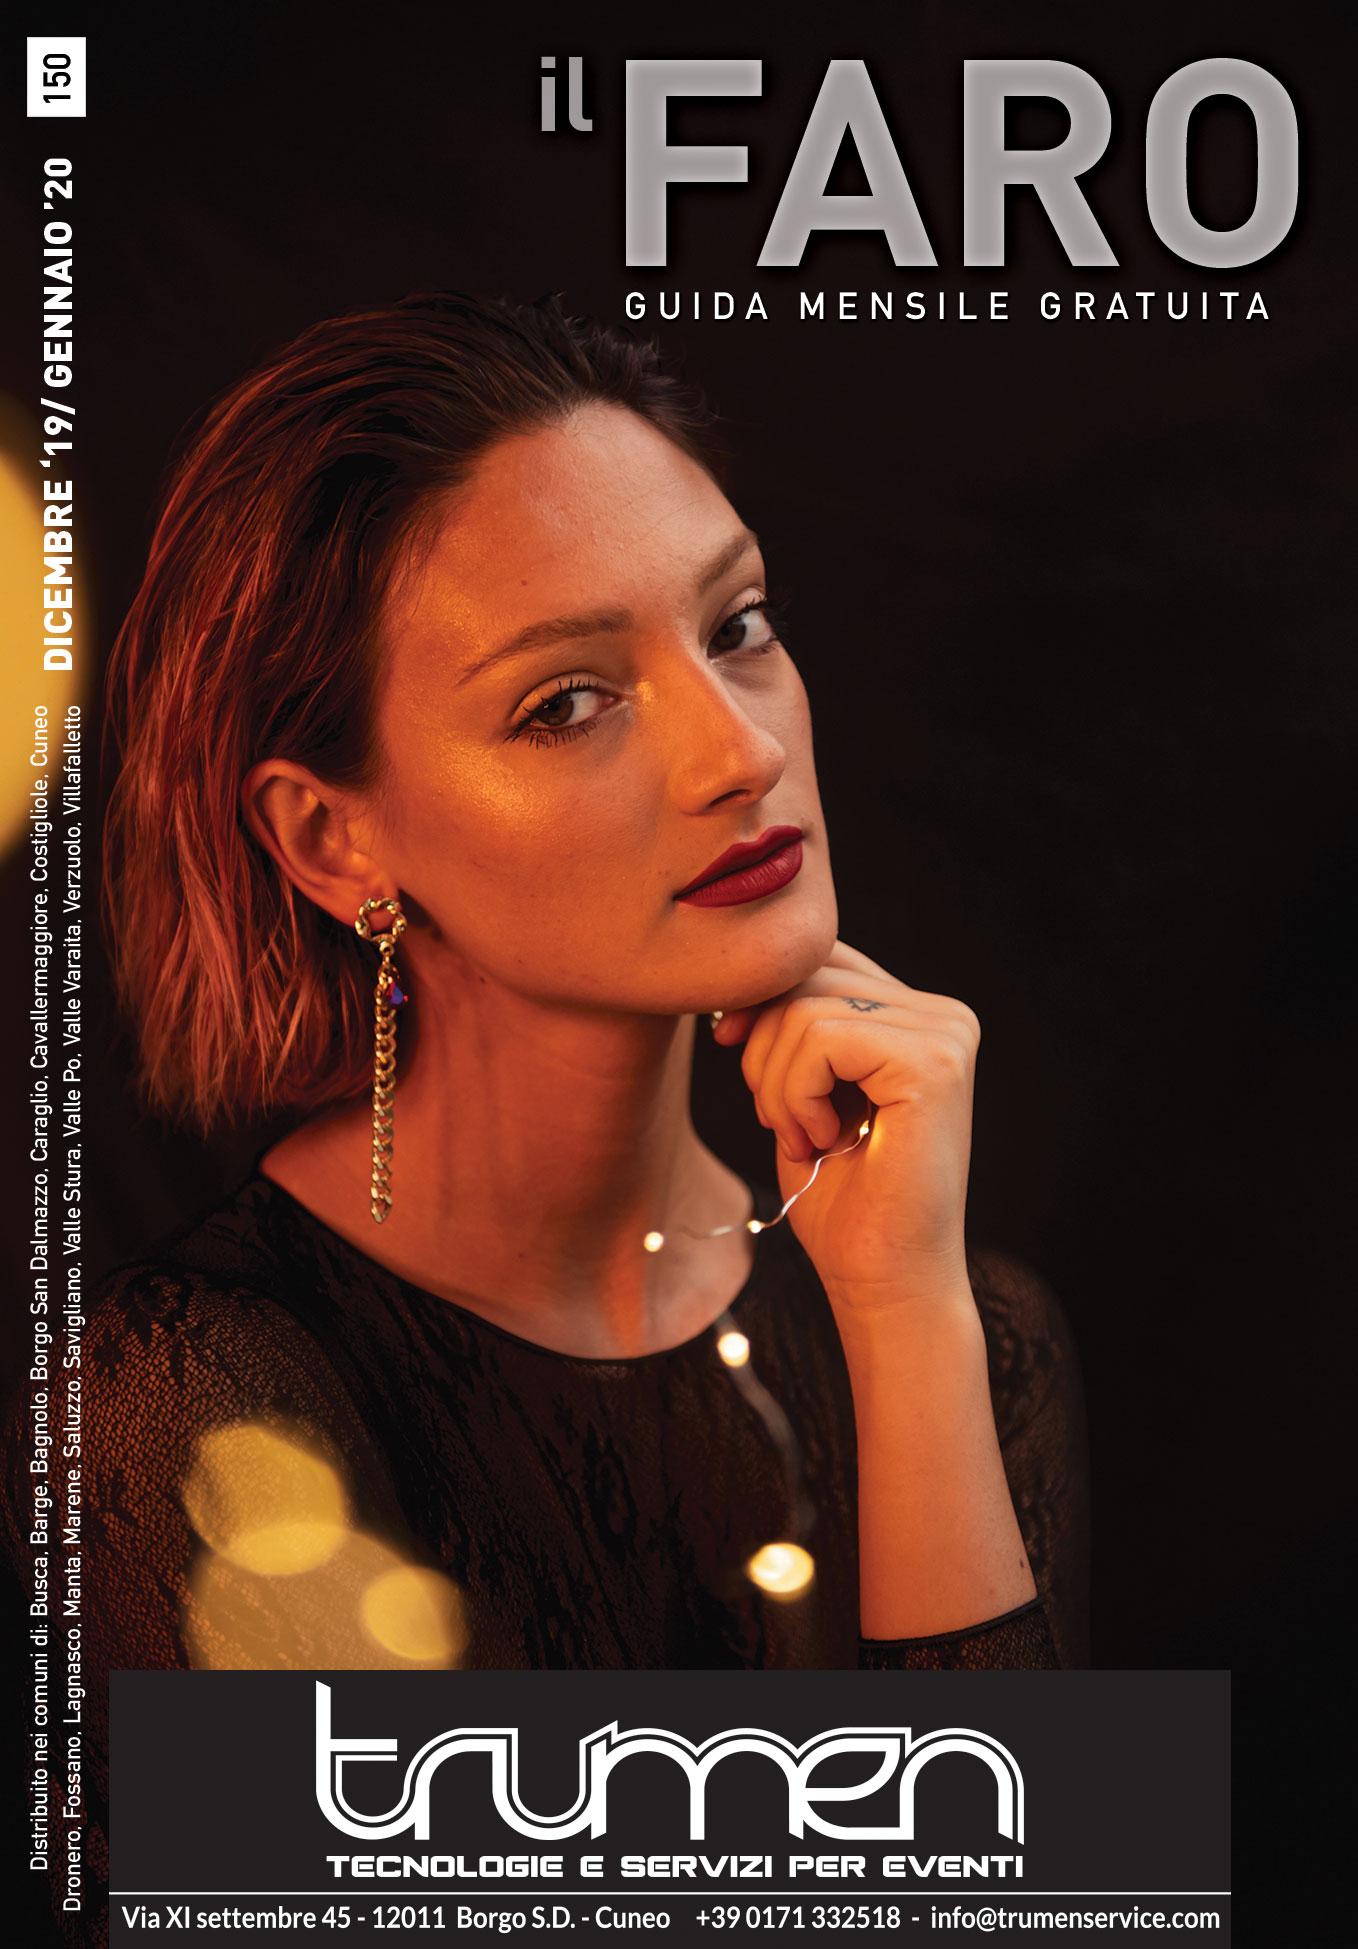 Beatrice Inguscio